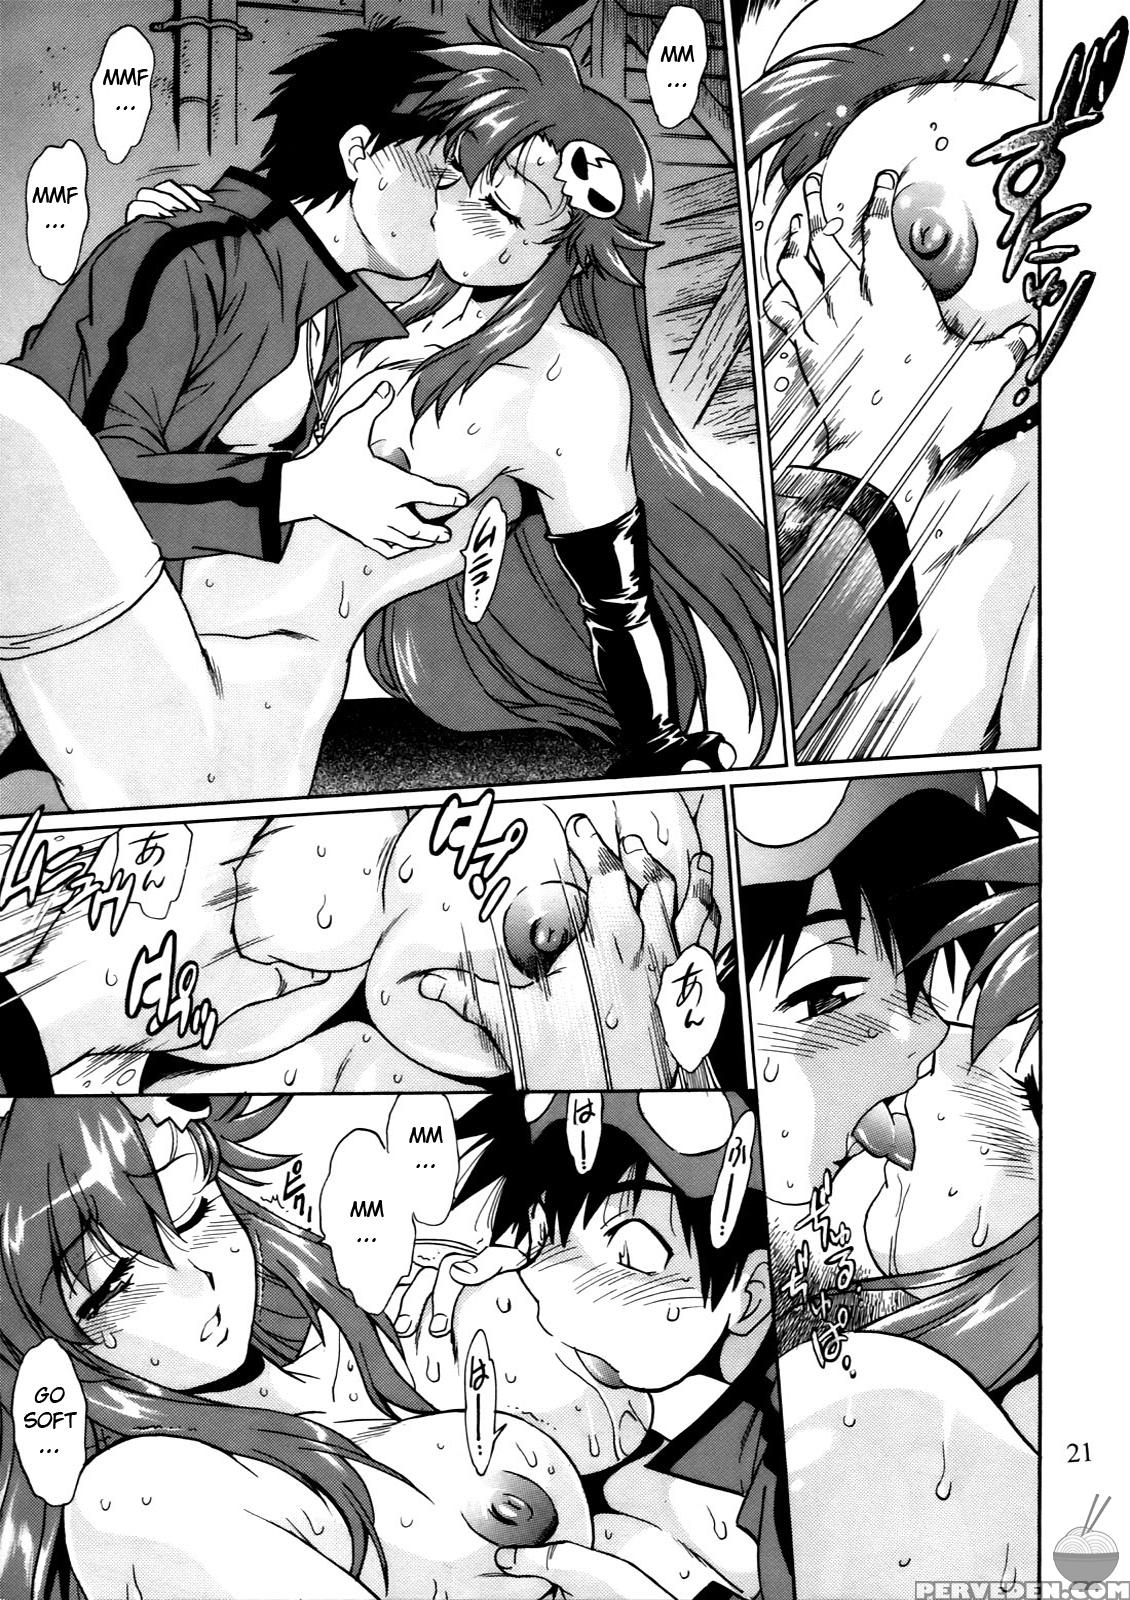 lagann hentai porn Yoko gurren